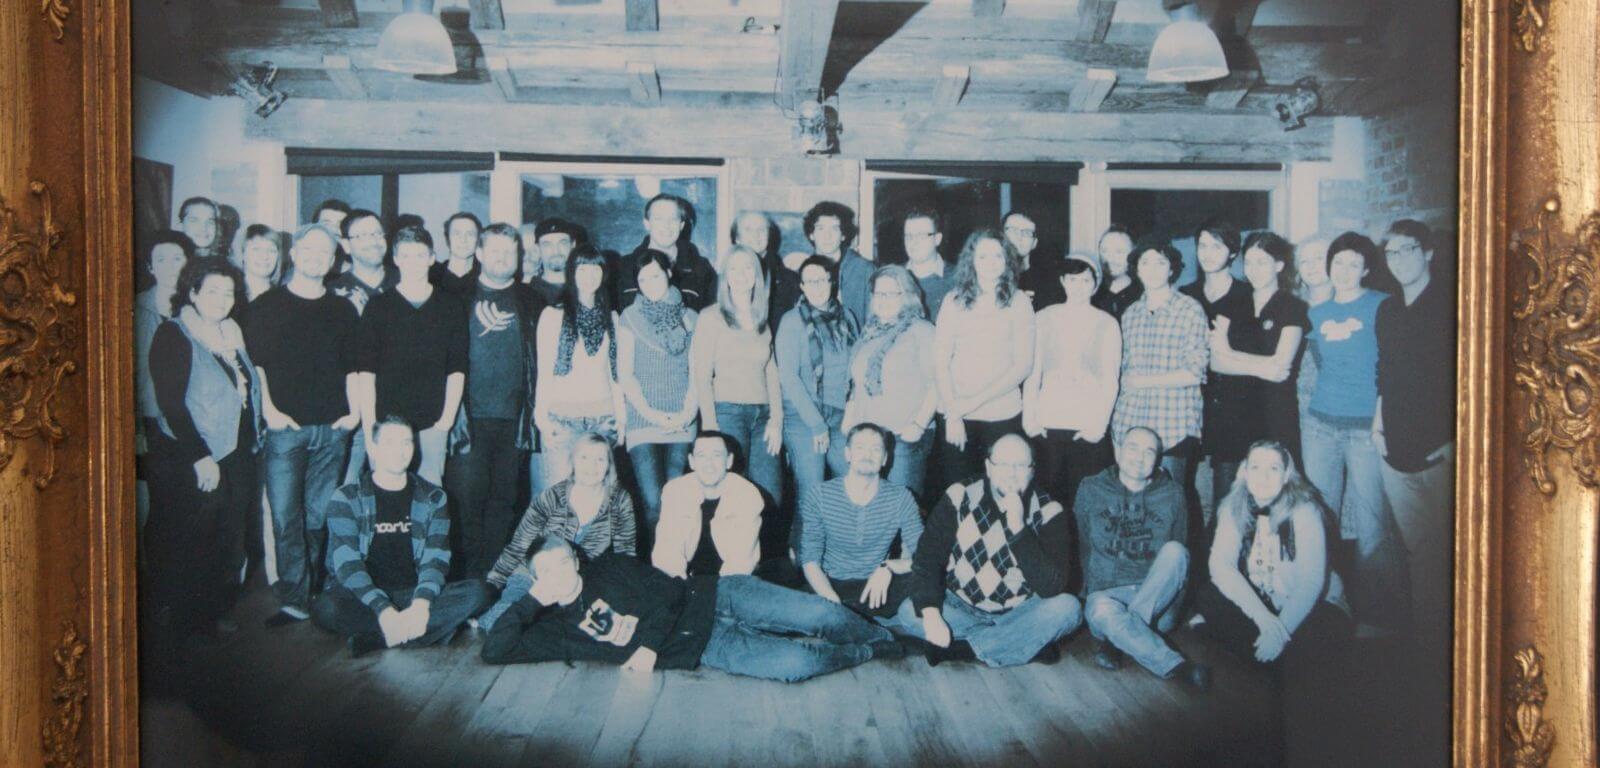 homepage-gruppenfoto.JPG